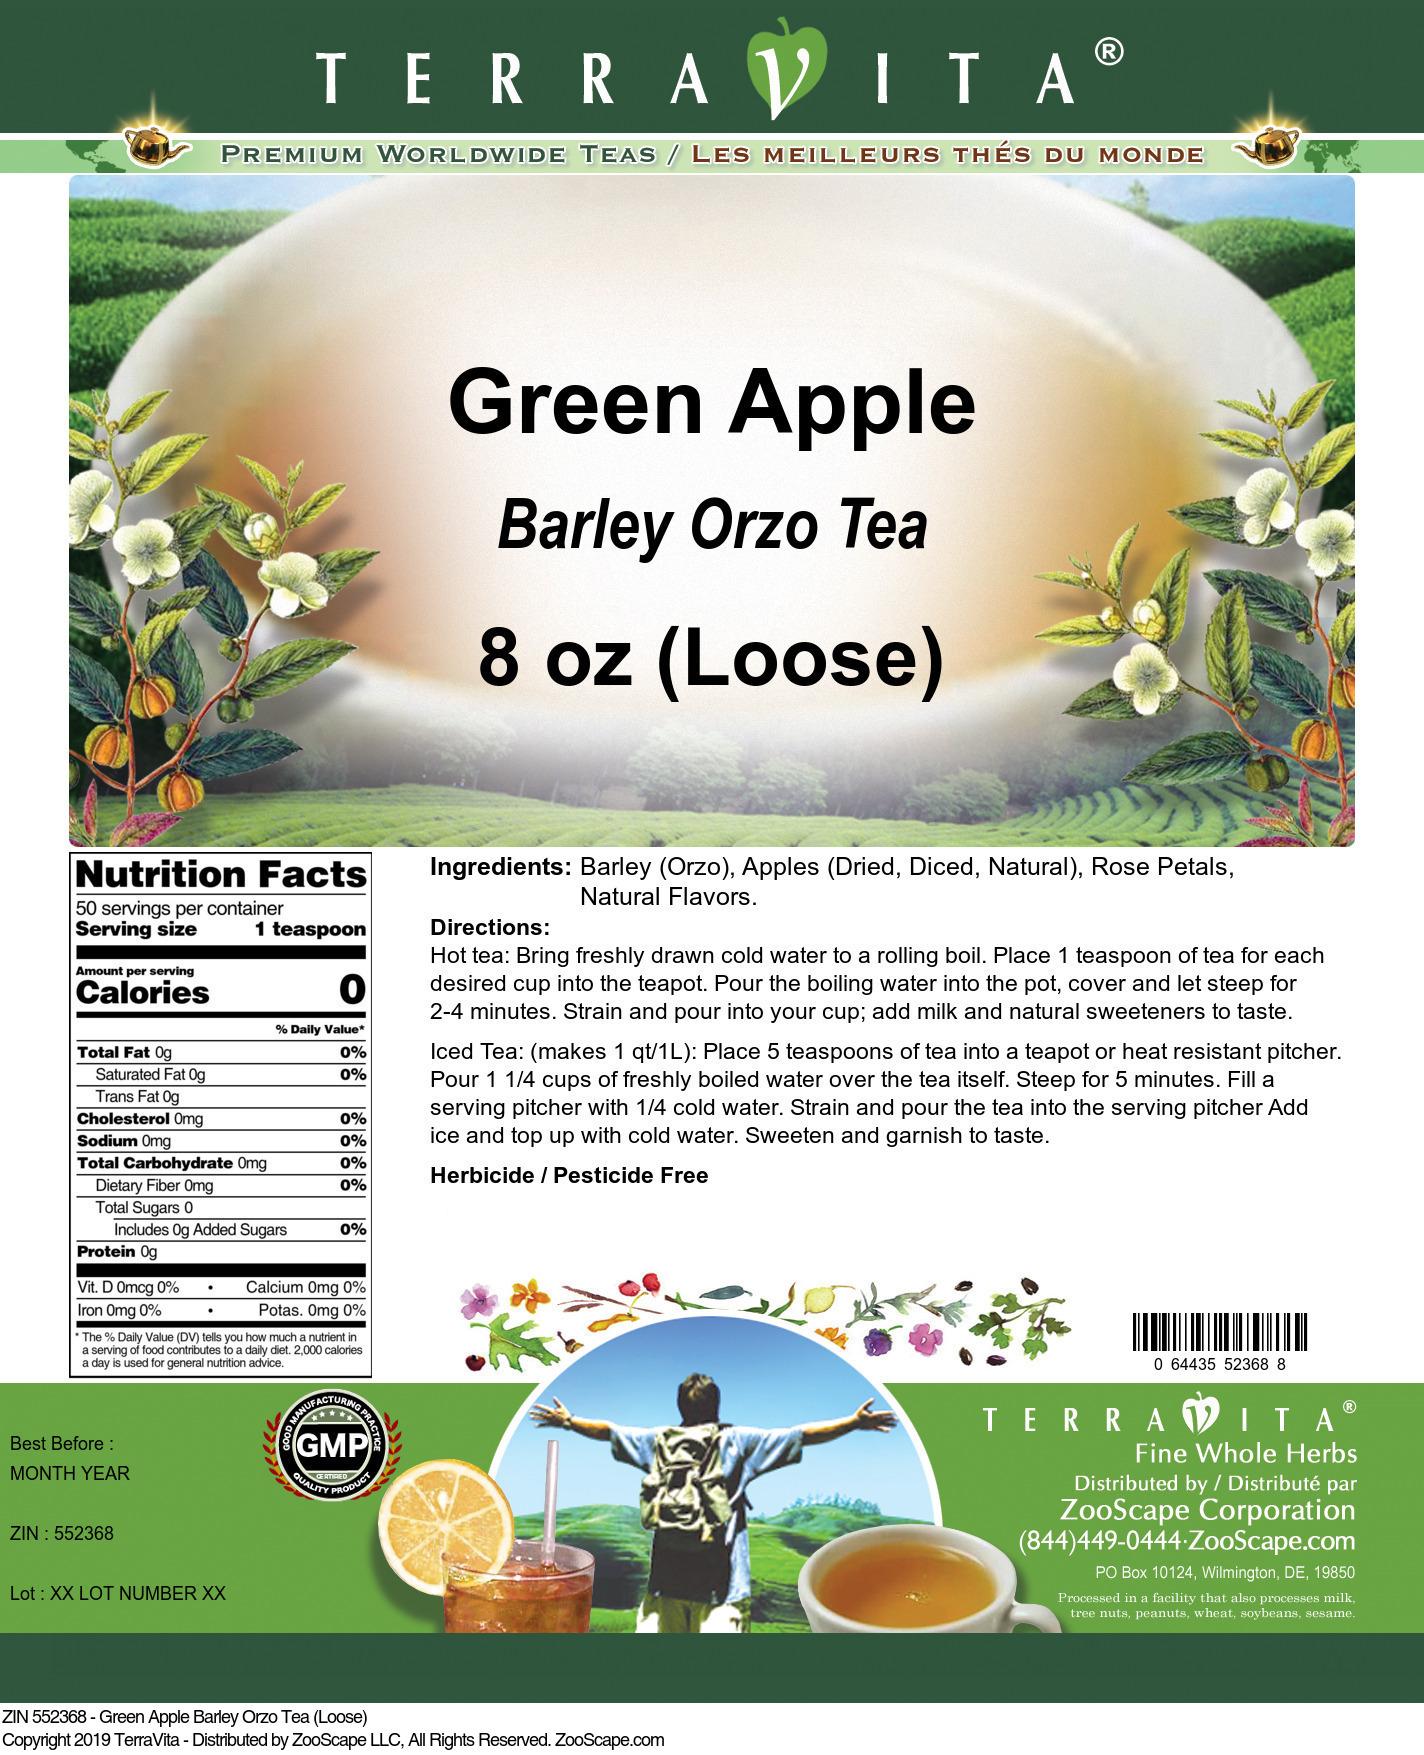 Green Apple Barley Orzo Tea (Loose)